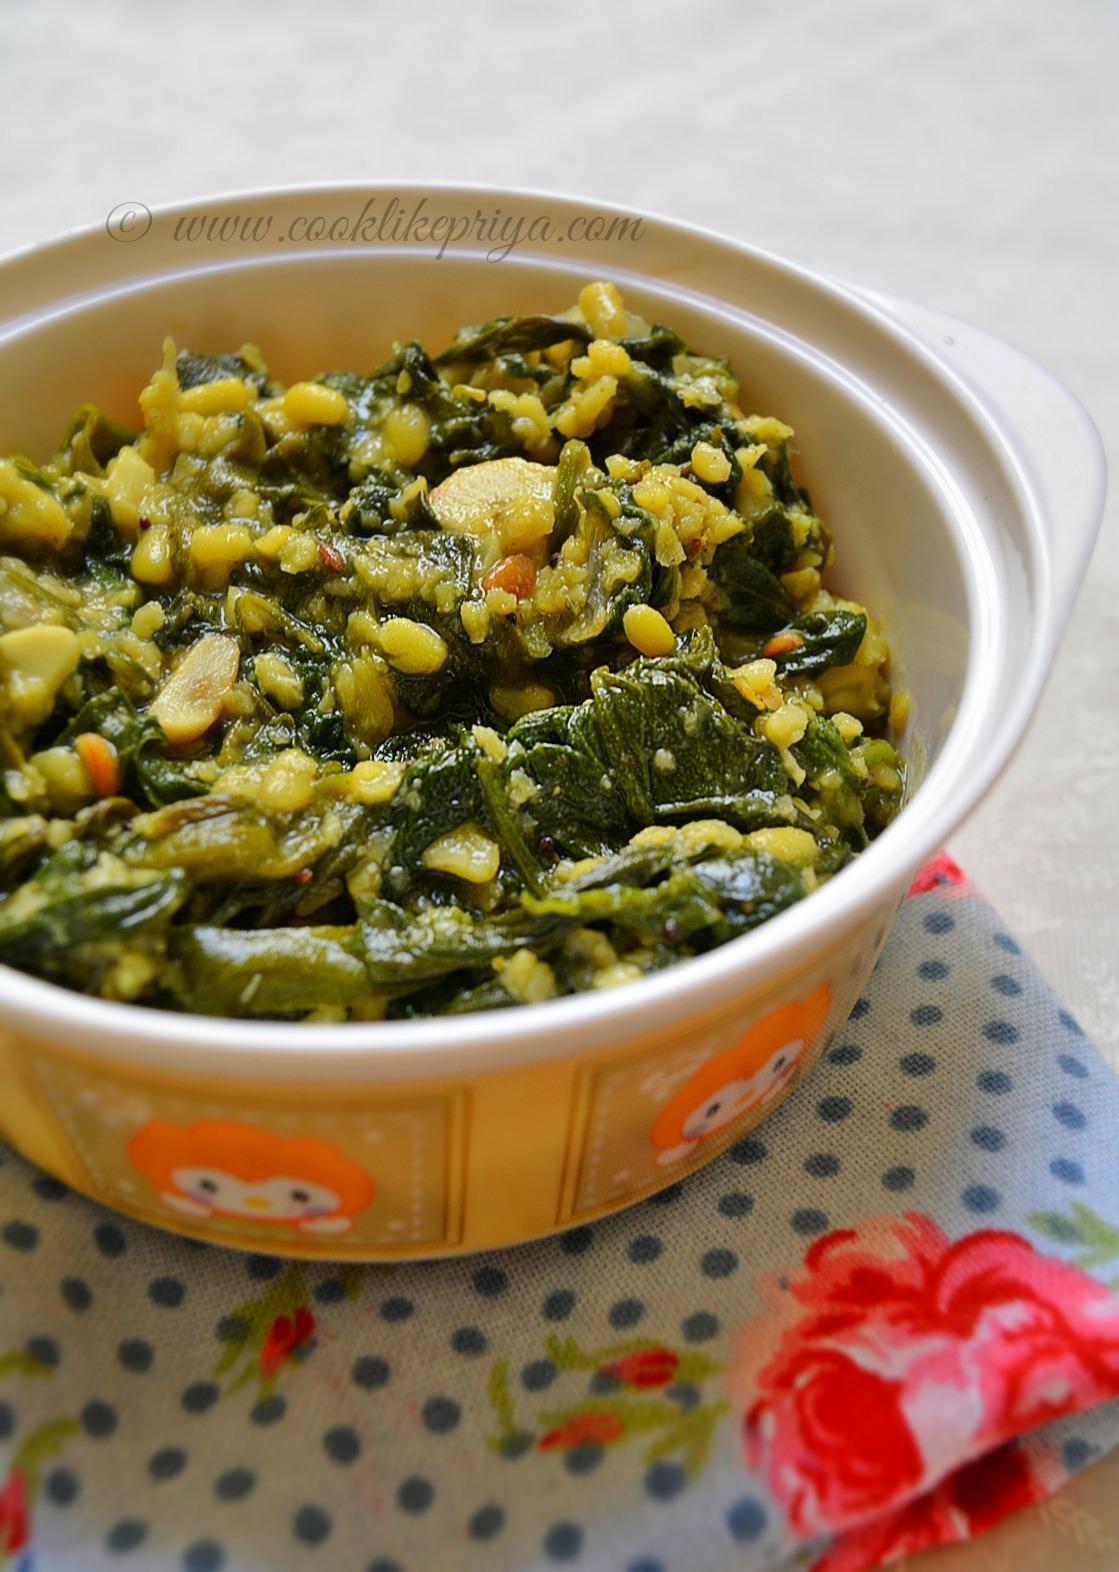 Paruppu Keerai Poriyal | Spinach Greens Stir Fry with home grown greens